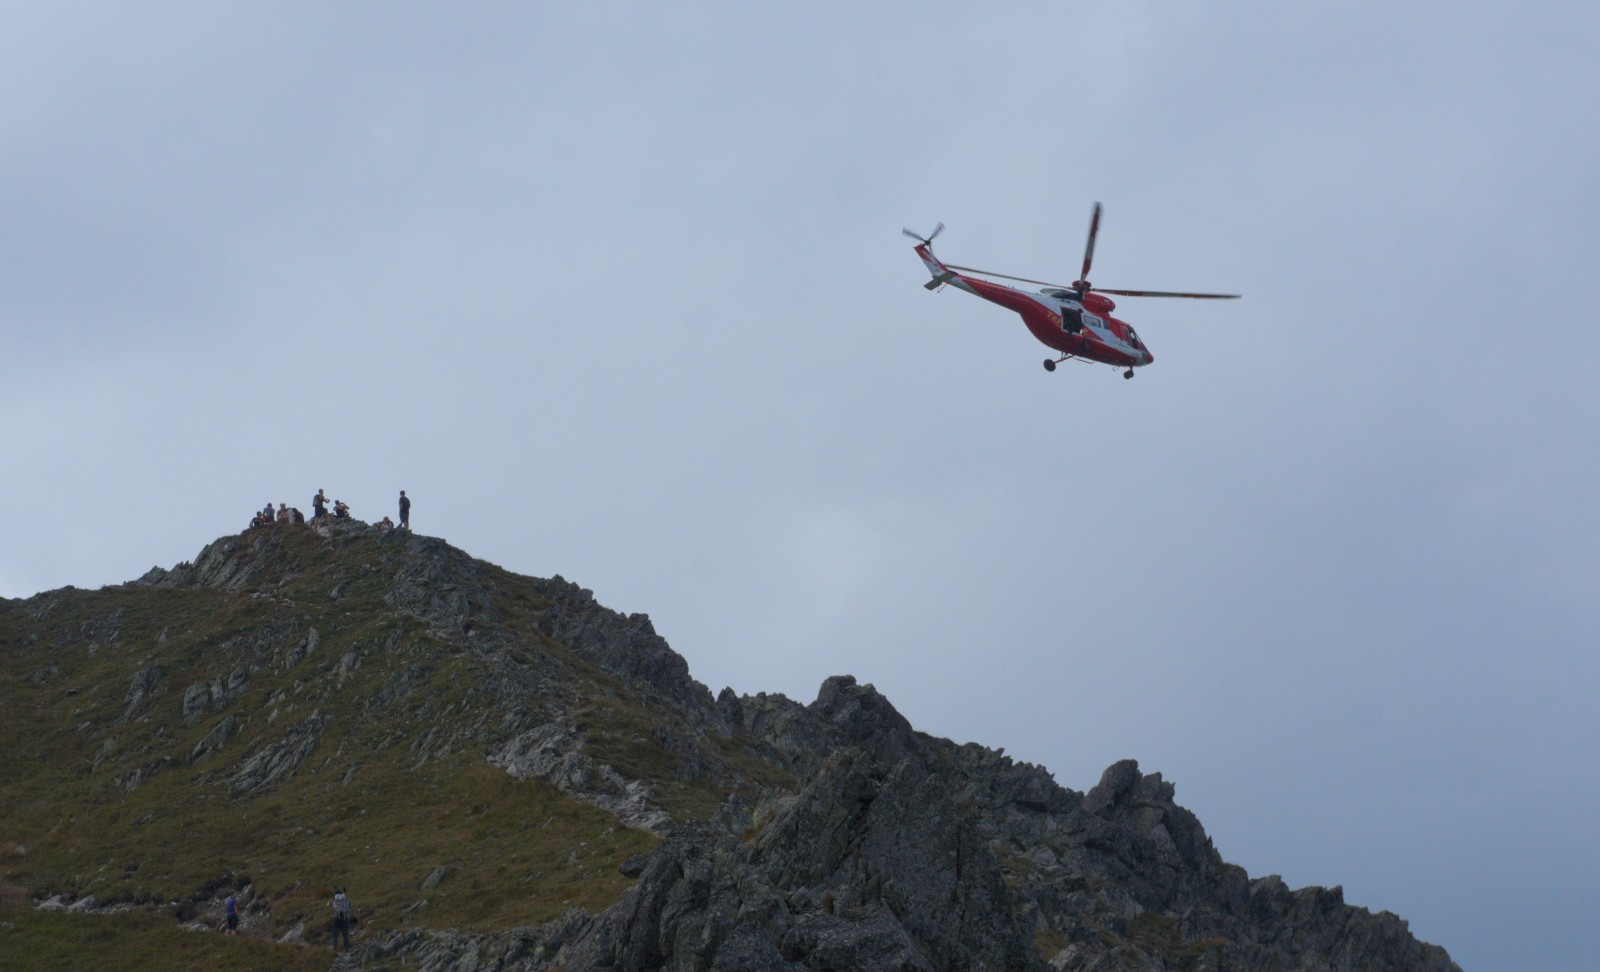 Vrtulník u Hrubého štítu / Szpiglasoweho Wierchu